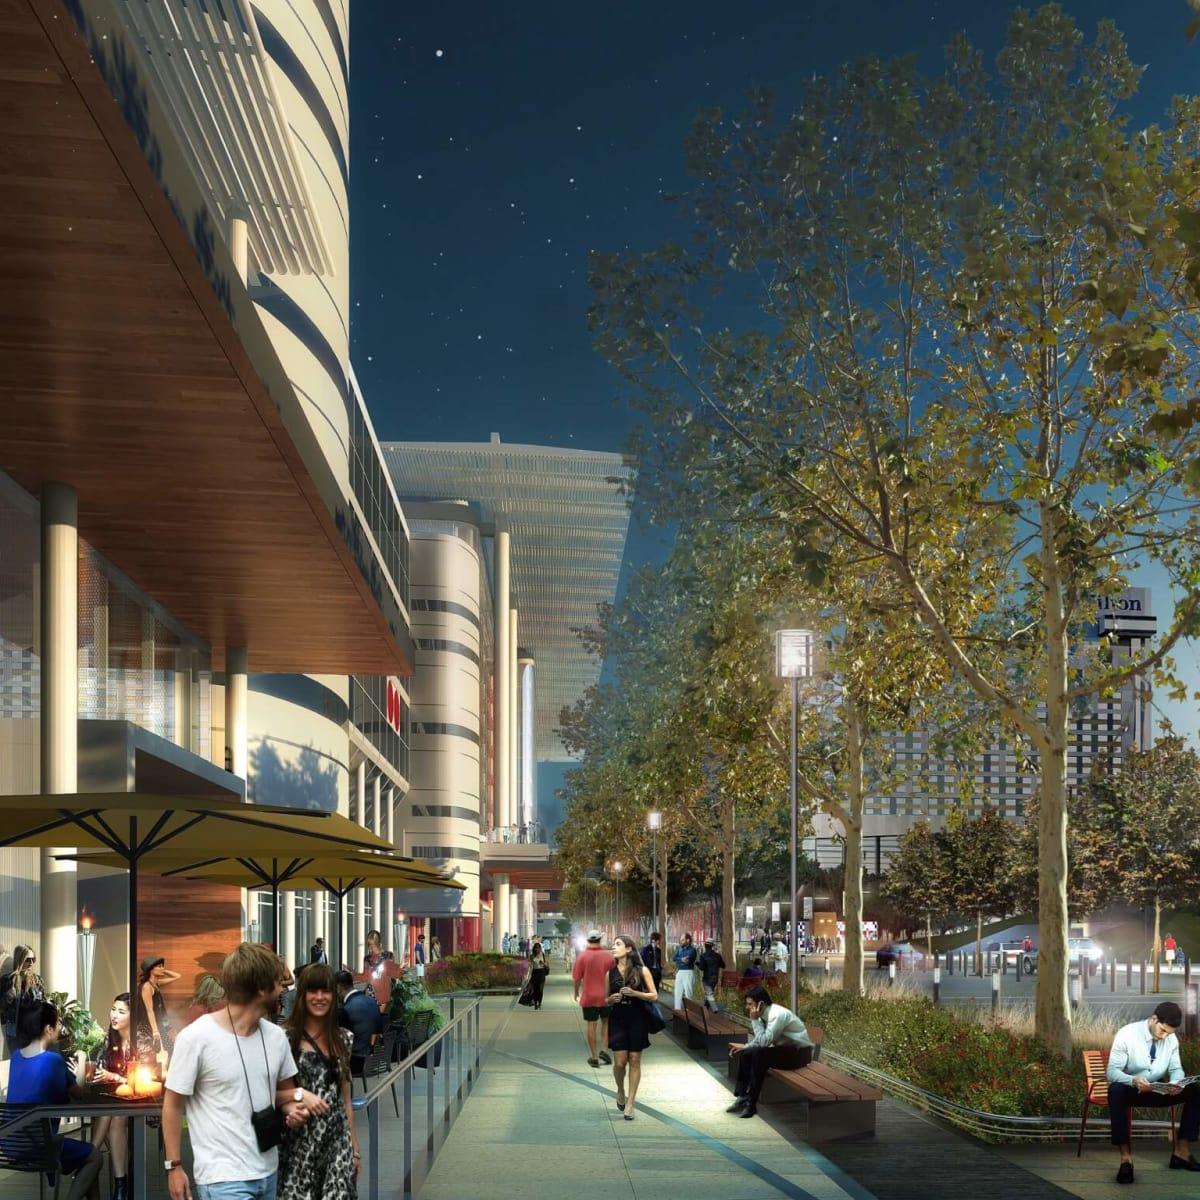 Avenida Houston sidewalk rendering